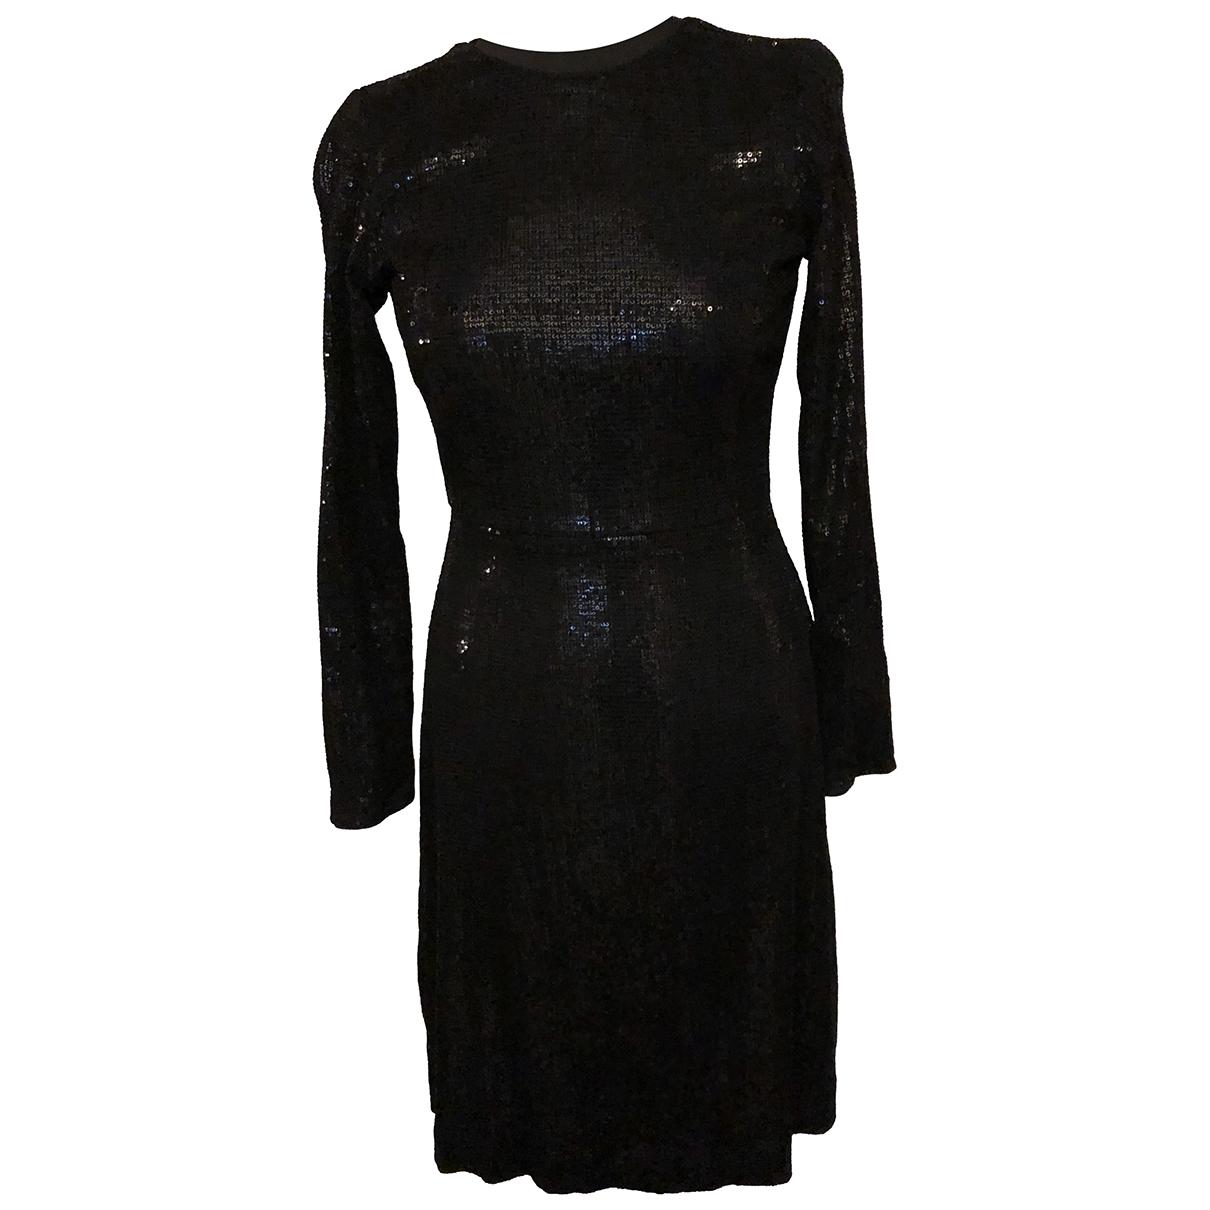 Jigsaw \N Kleid in  Schwarz Baumwolle - Elasthan